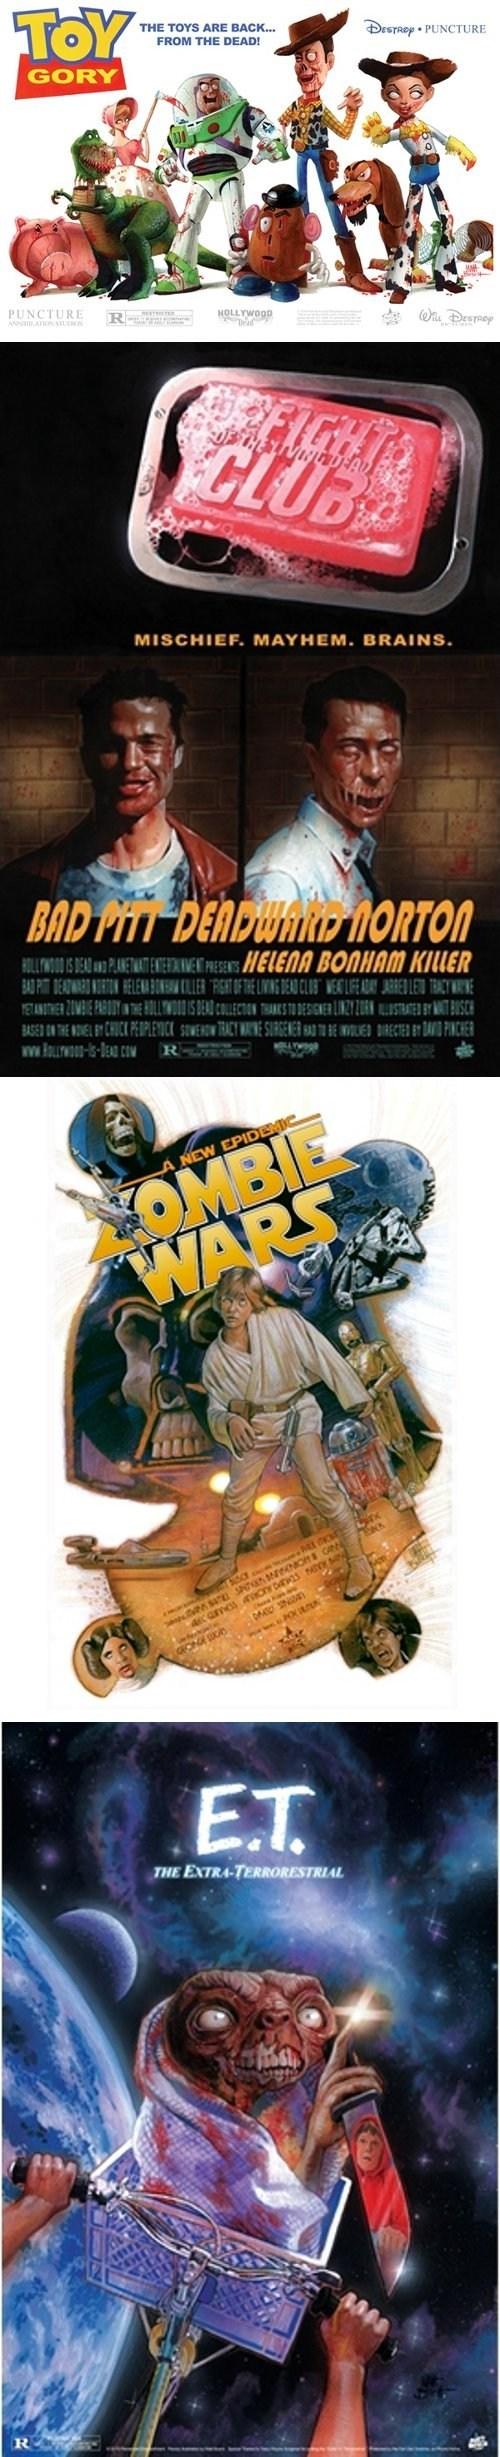 Movie posters zombie - 7074714112